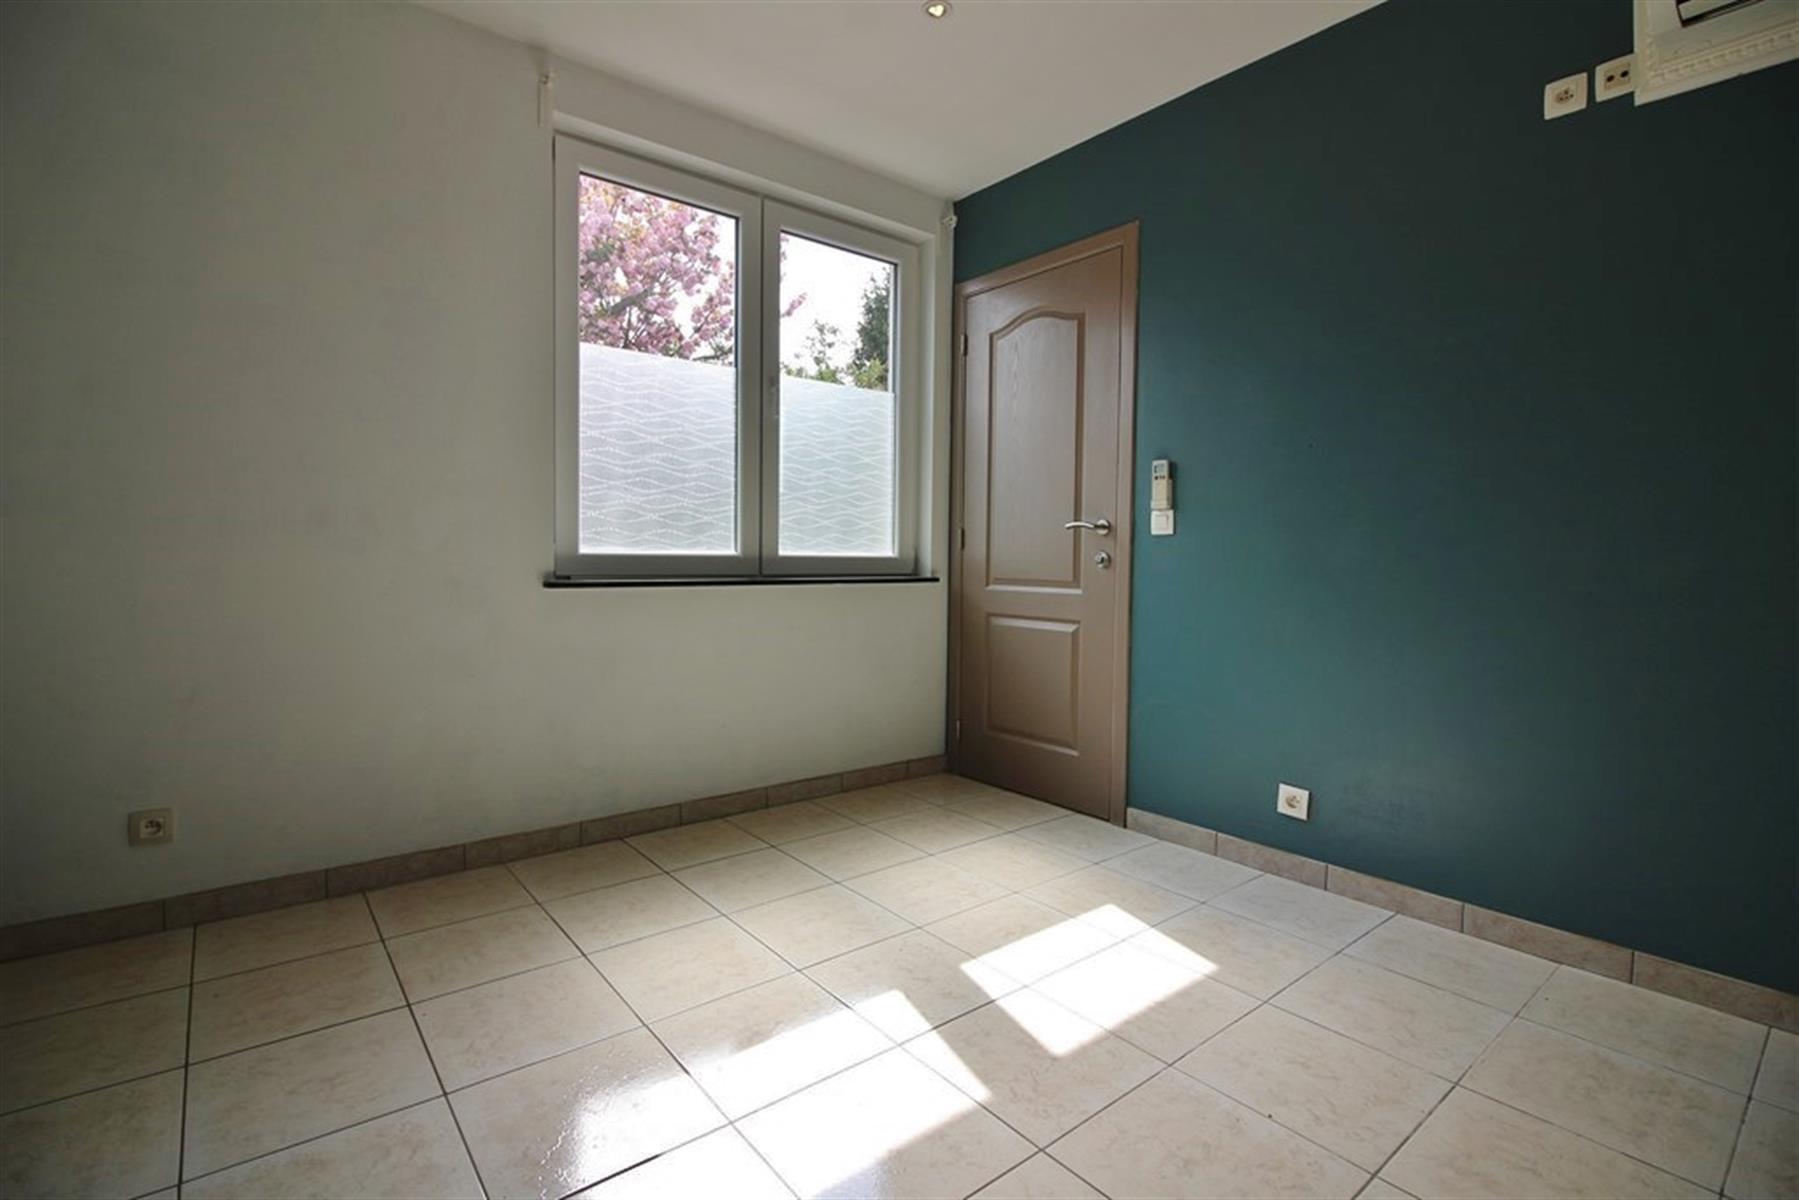 Maison - Herstal - #4350326-8